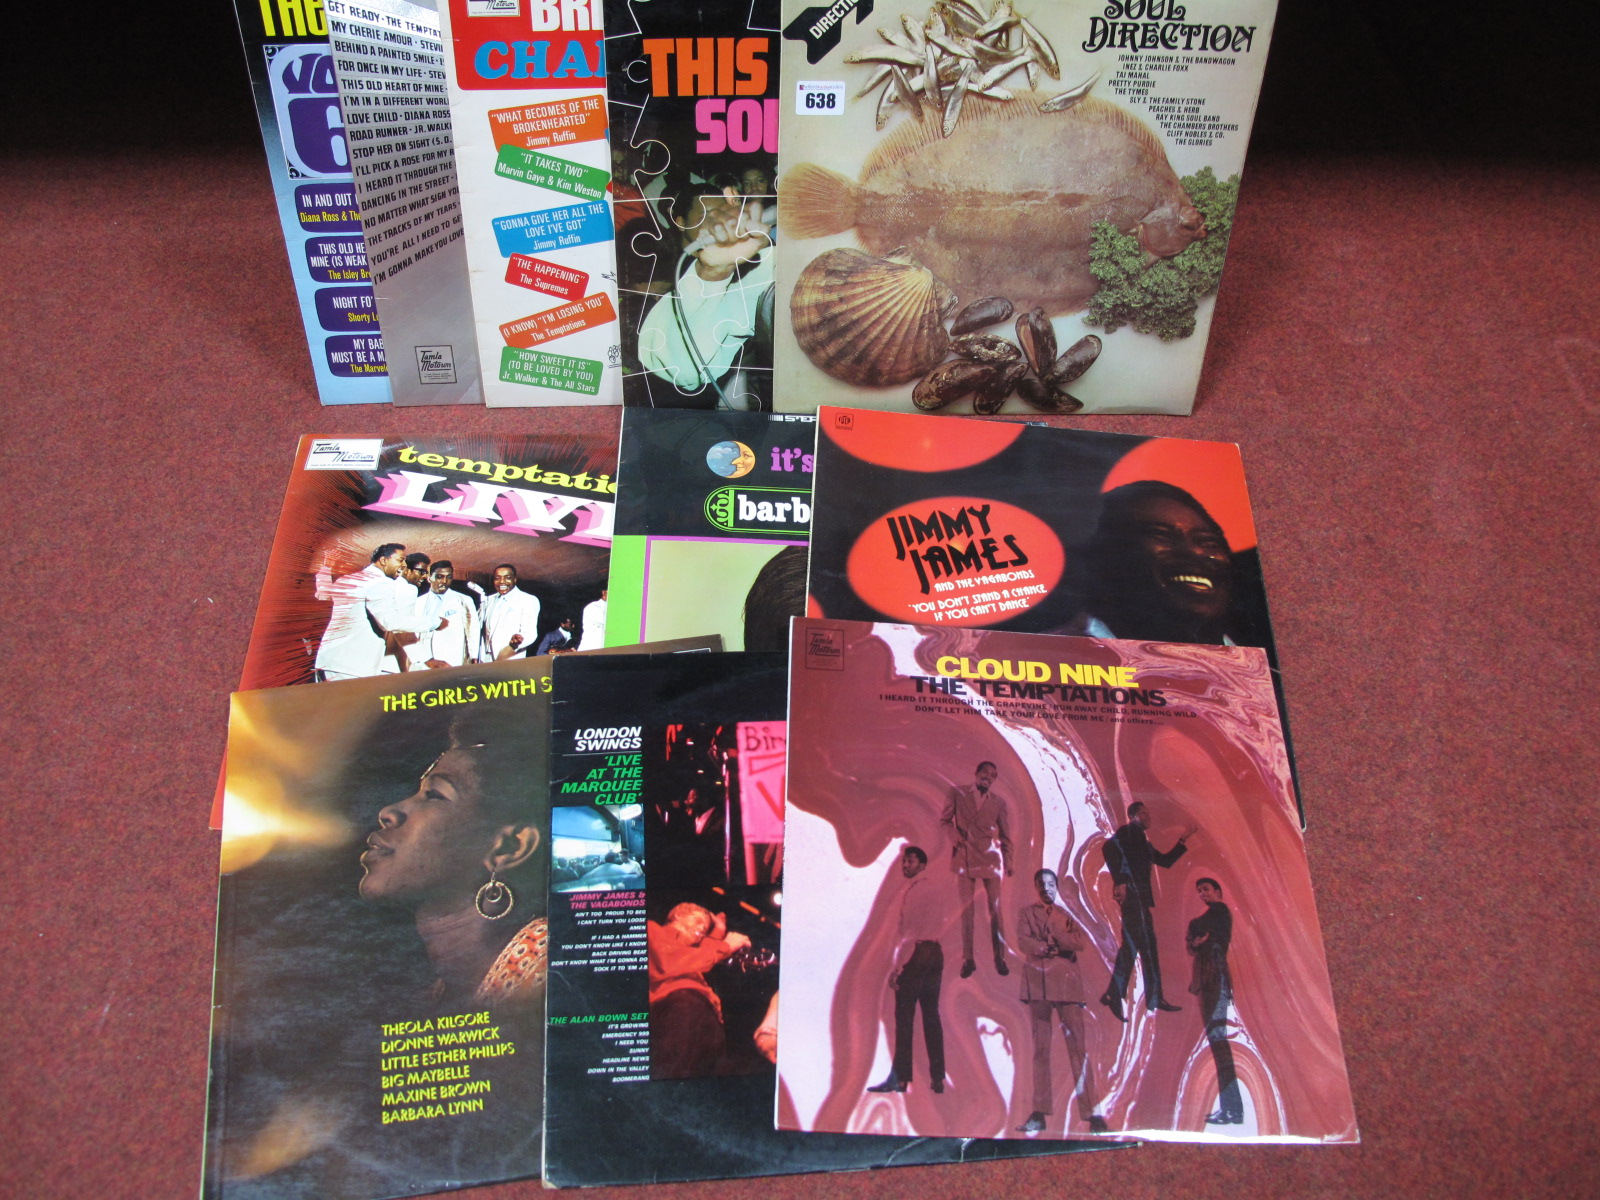 Lot 638 - Soul LP's - Barbara Lewis 'It's Magic' (Atlantic), Temptations 'Live' (Tamla, Stereo), 'Cloud